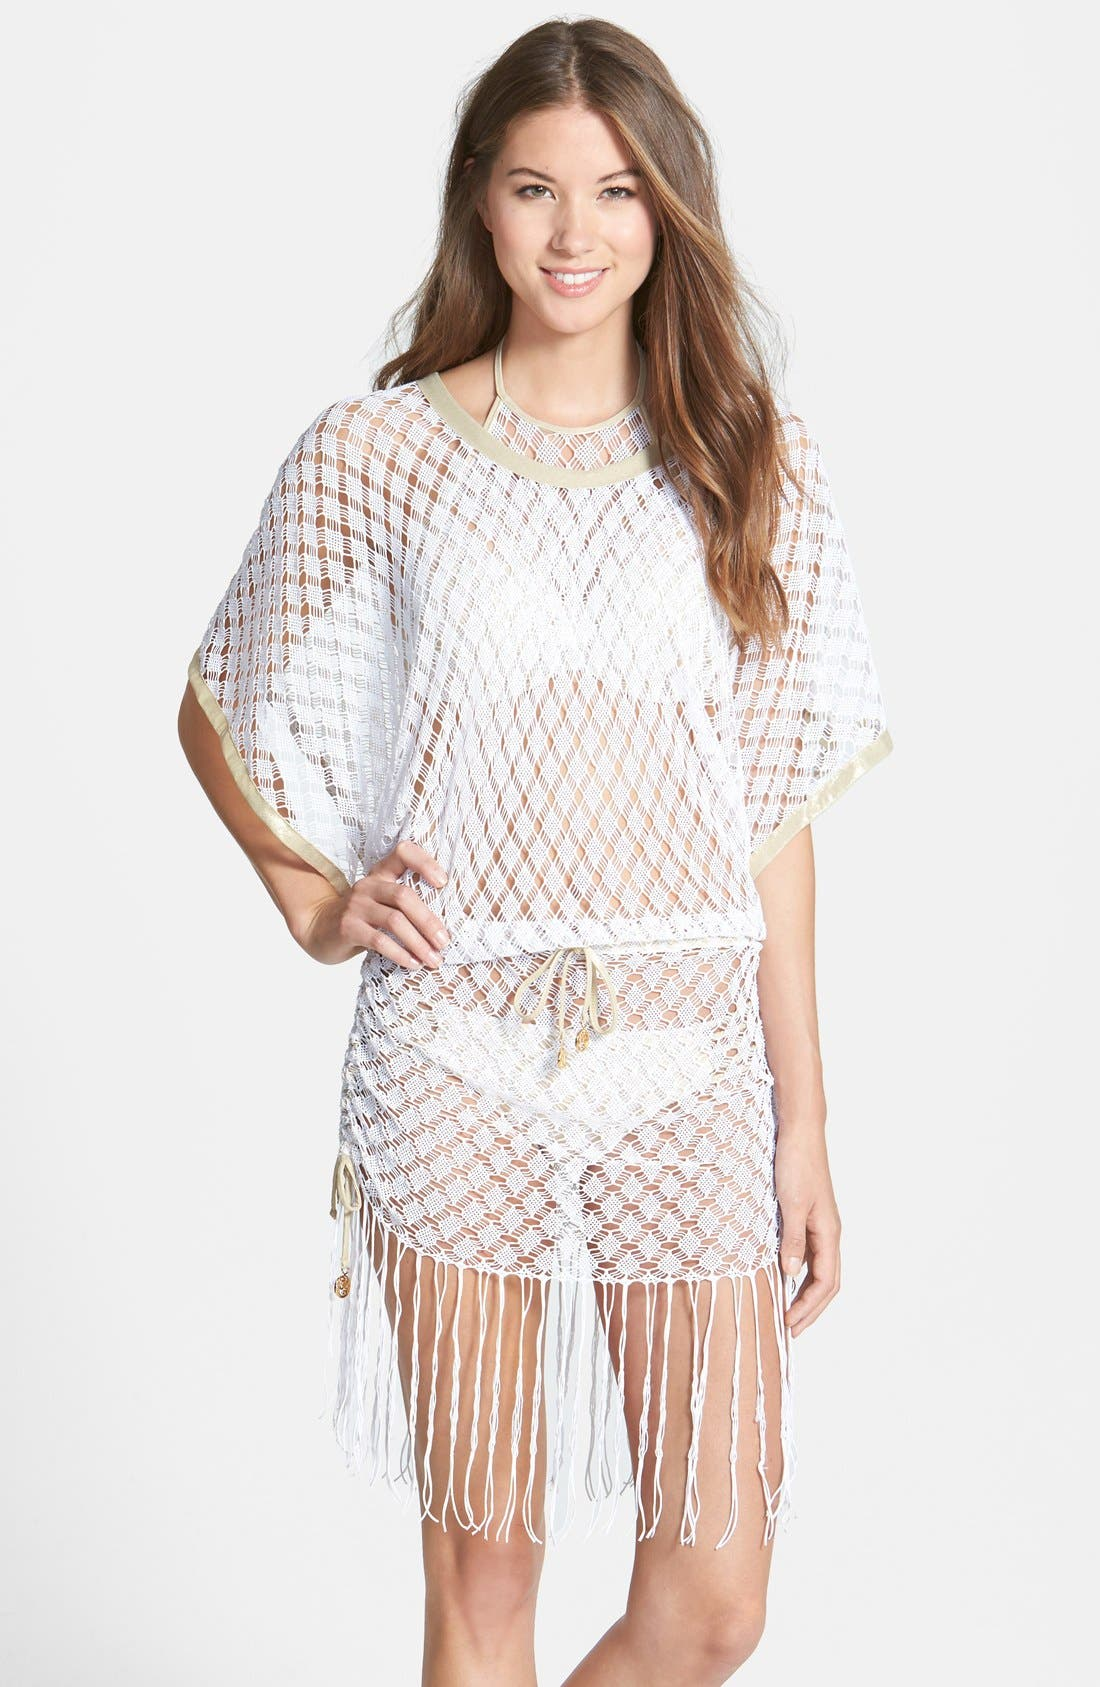 Alternate Image 1 Selected - Luli Fama 'South Beach' Crochet Cover-Up Dress